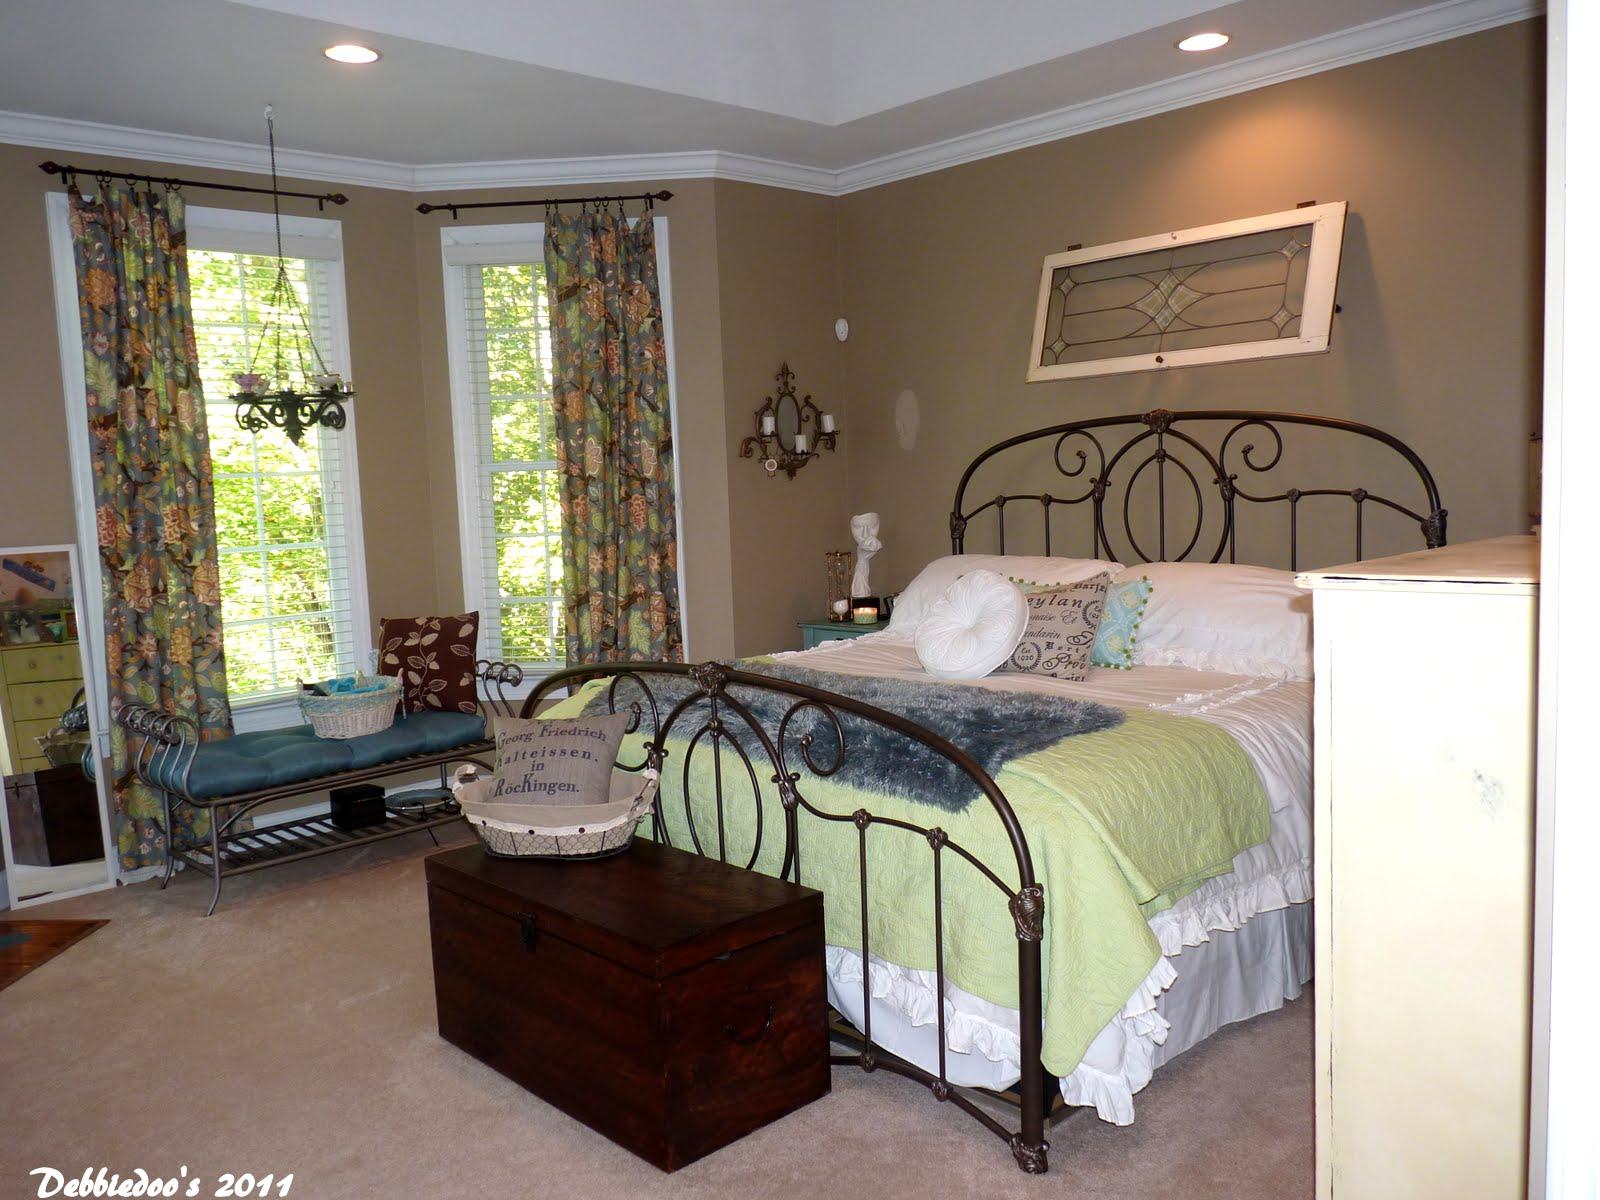 Pottery barn inspired master bedroom shabby chic style - Pottery barn master bedroom ideas ...